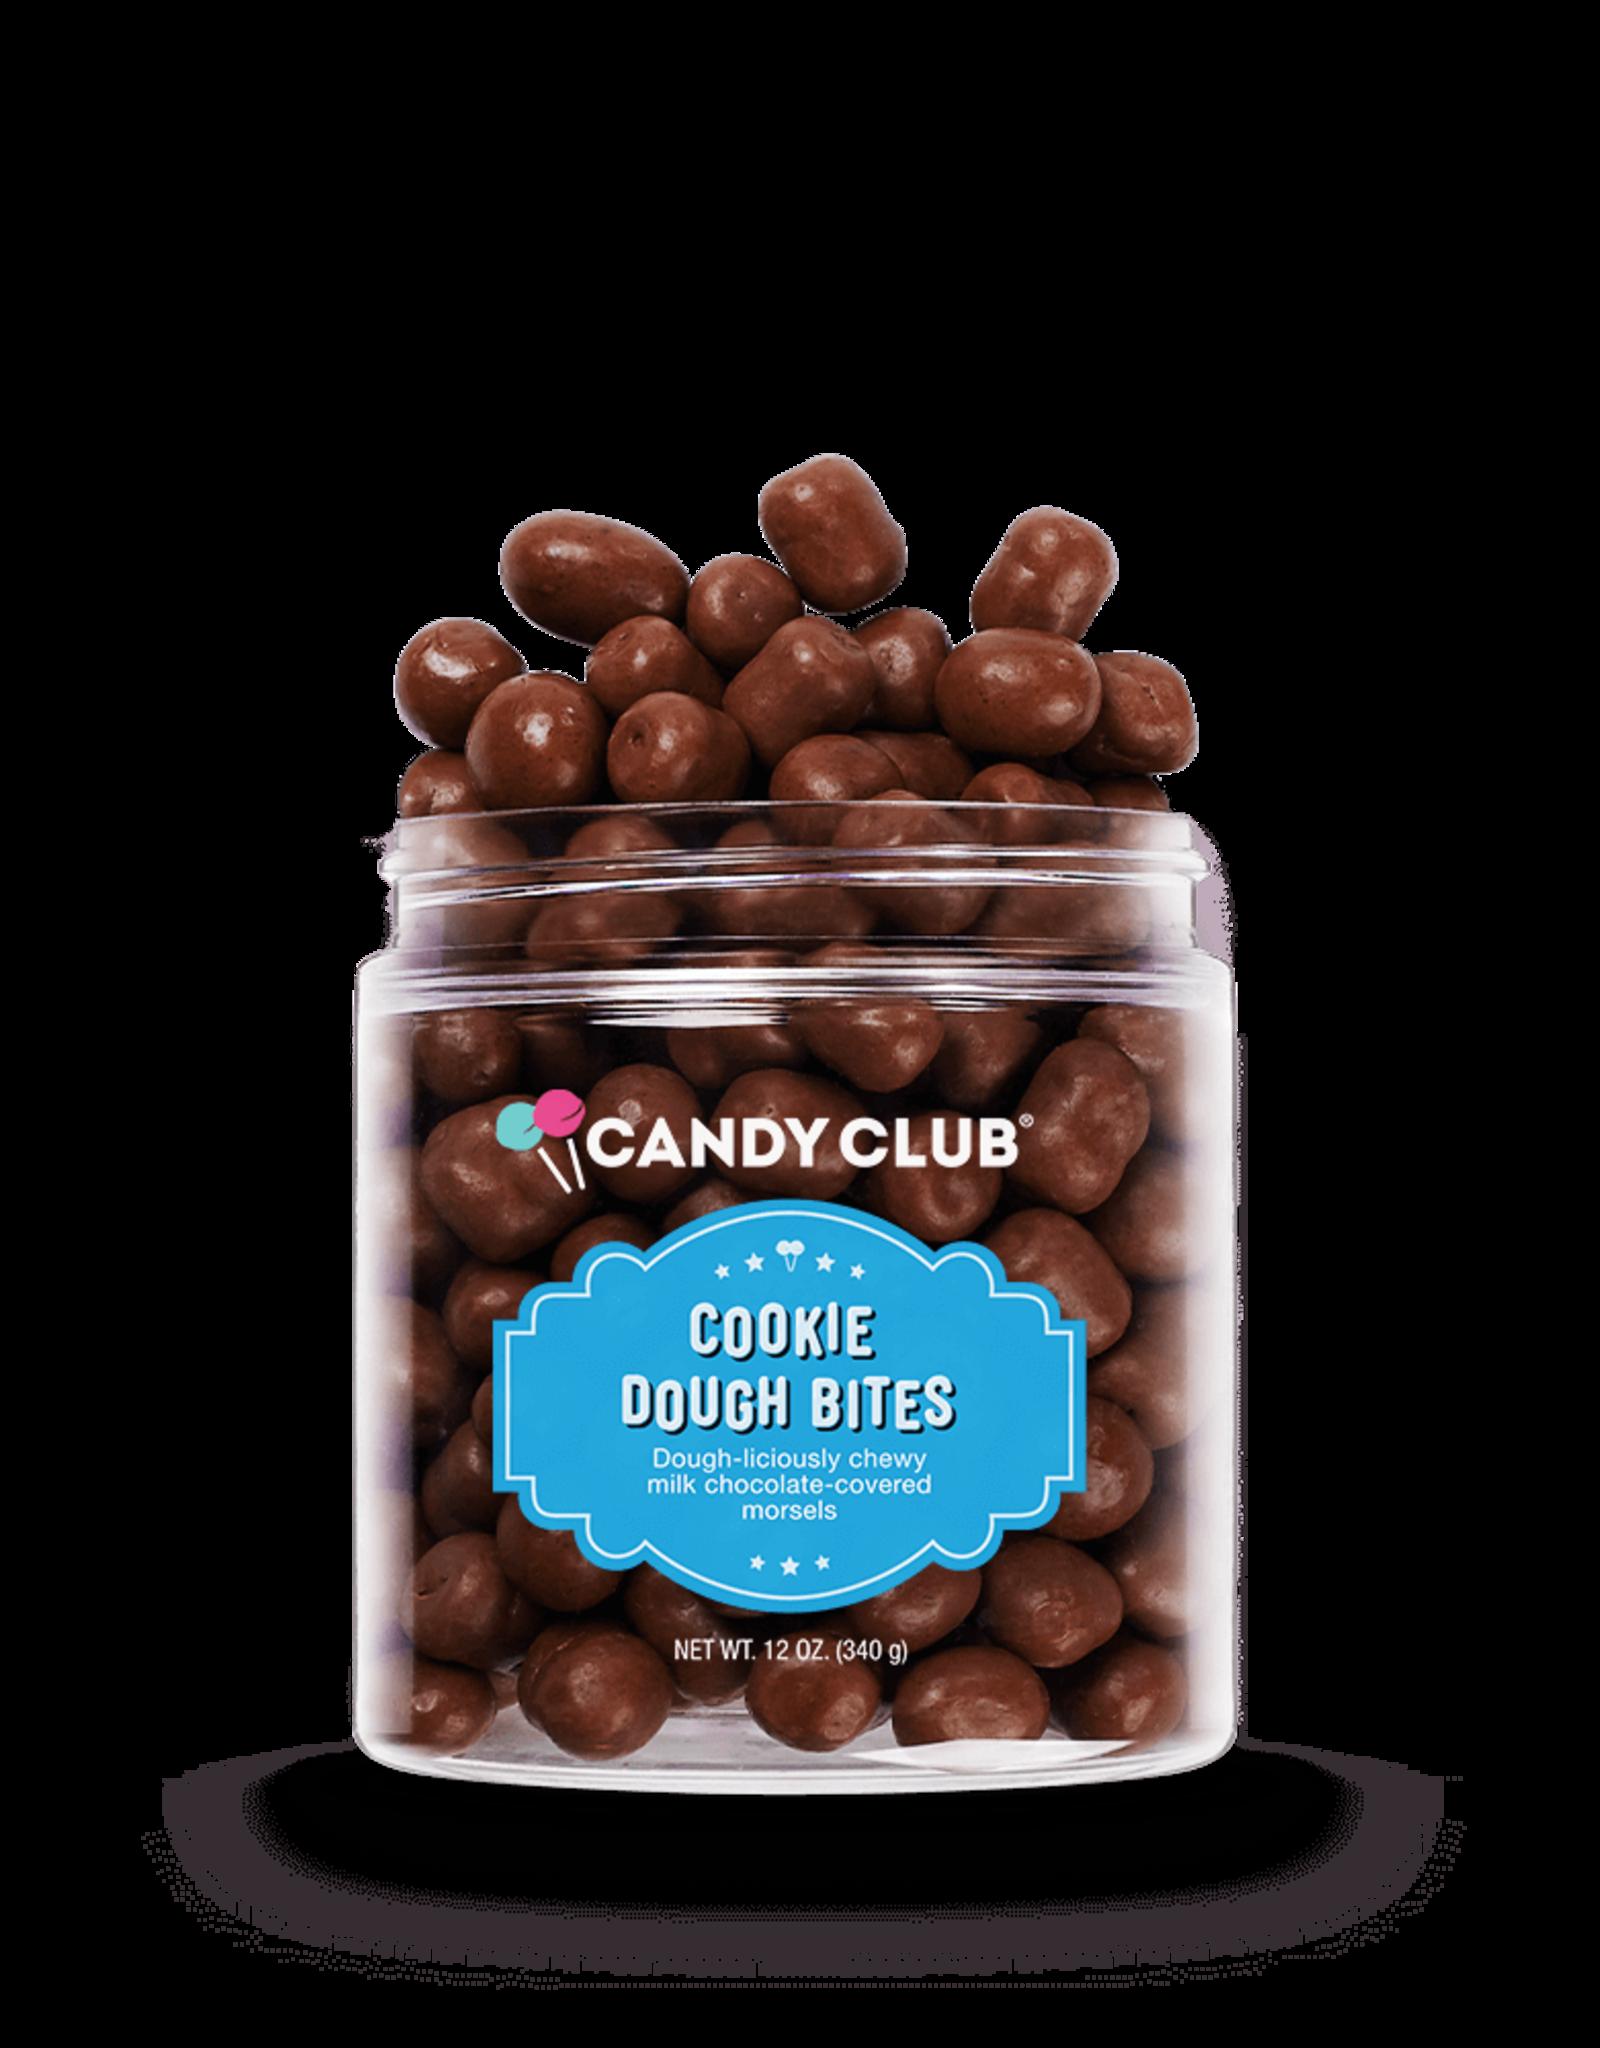 Candy Club LLC Candy Club Cookie Dough Bites